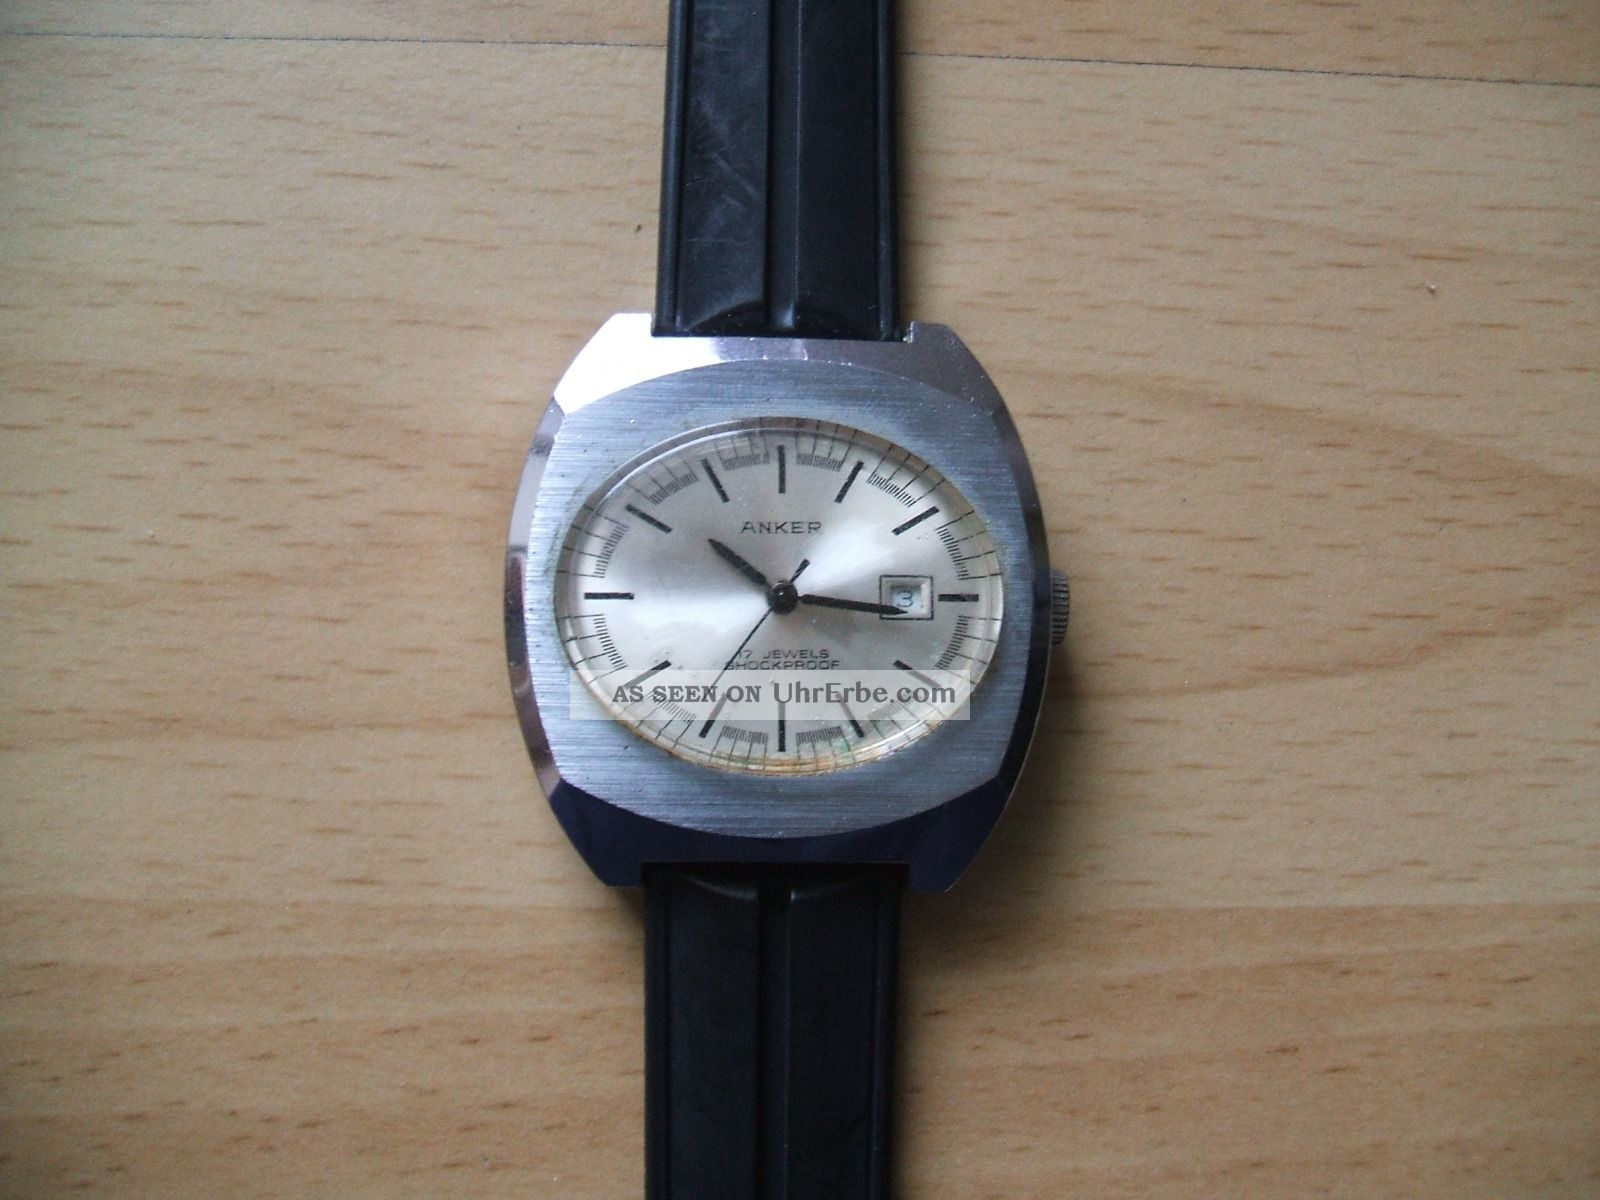 Uhr Sammlung An Bastler Alte Anker Mechanisch - Handaufzug 17 Jewels Herrenuhr Armbanduhren Bild